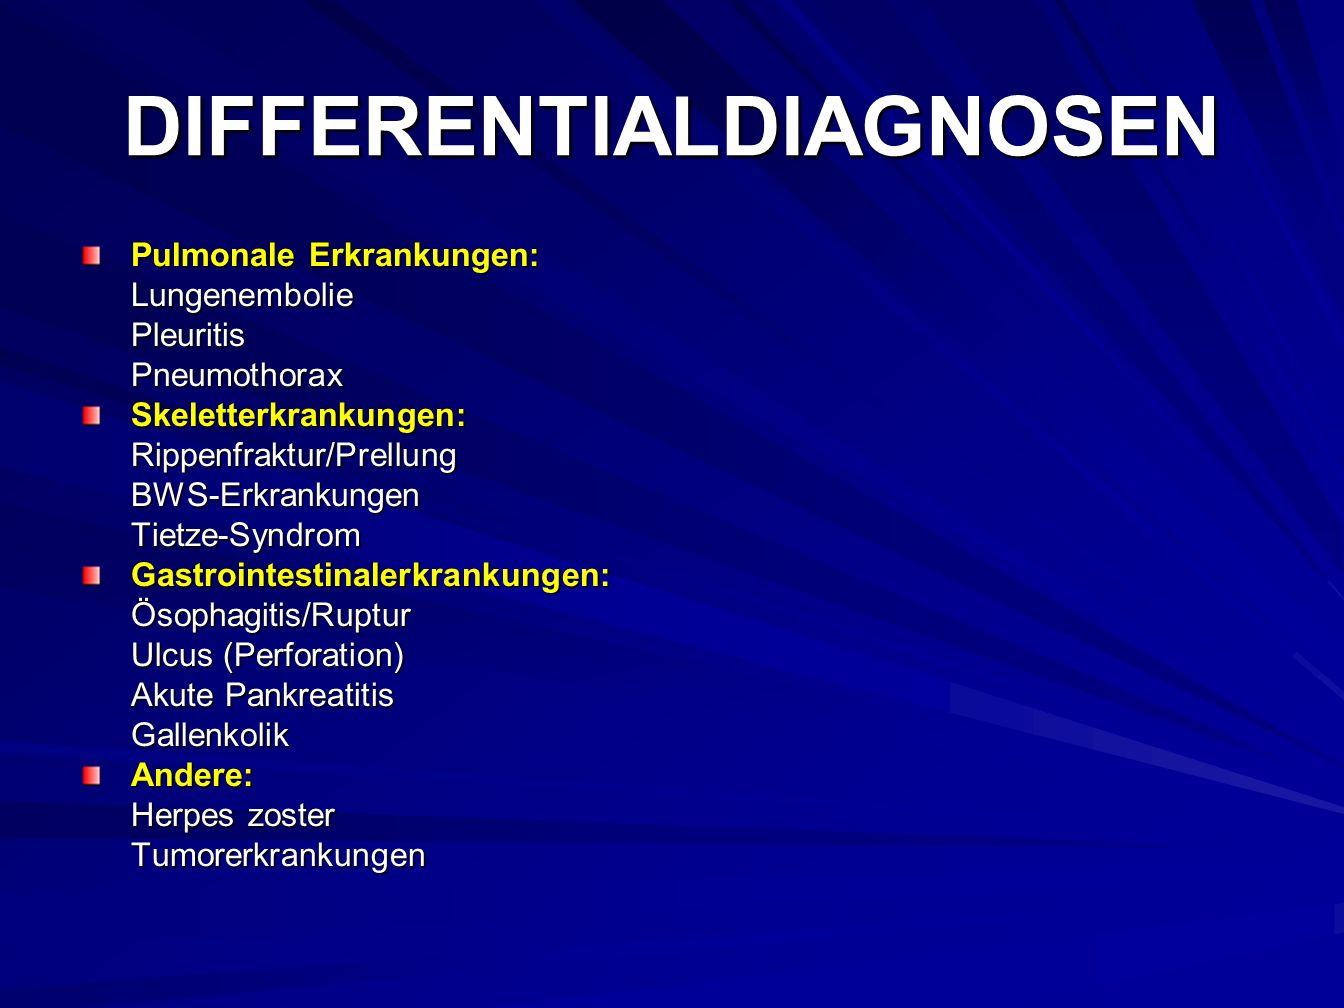 DIFFERENTIALDIAGNOSEN Pulmonale Erkrankungen: LungenemboliePleuritisPneumothoraxSkeletterkrankungen:Rippenfraktur/PrellungBWS-ErkrankungenTietze-SyndromGastrointestinalerkrankungen:Ösophagitis/Ruptur Ulcus (Perforation) Akute Pankreatitis GallenkolikAndere: Herpes zoster Tumorerkrankungen